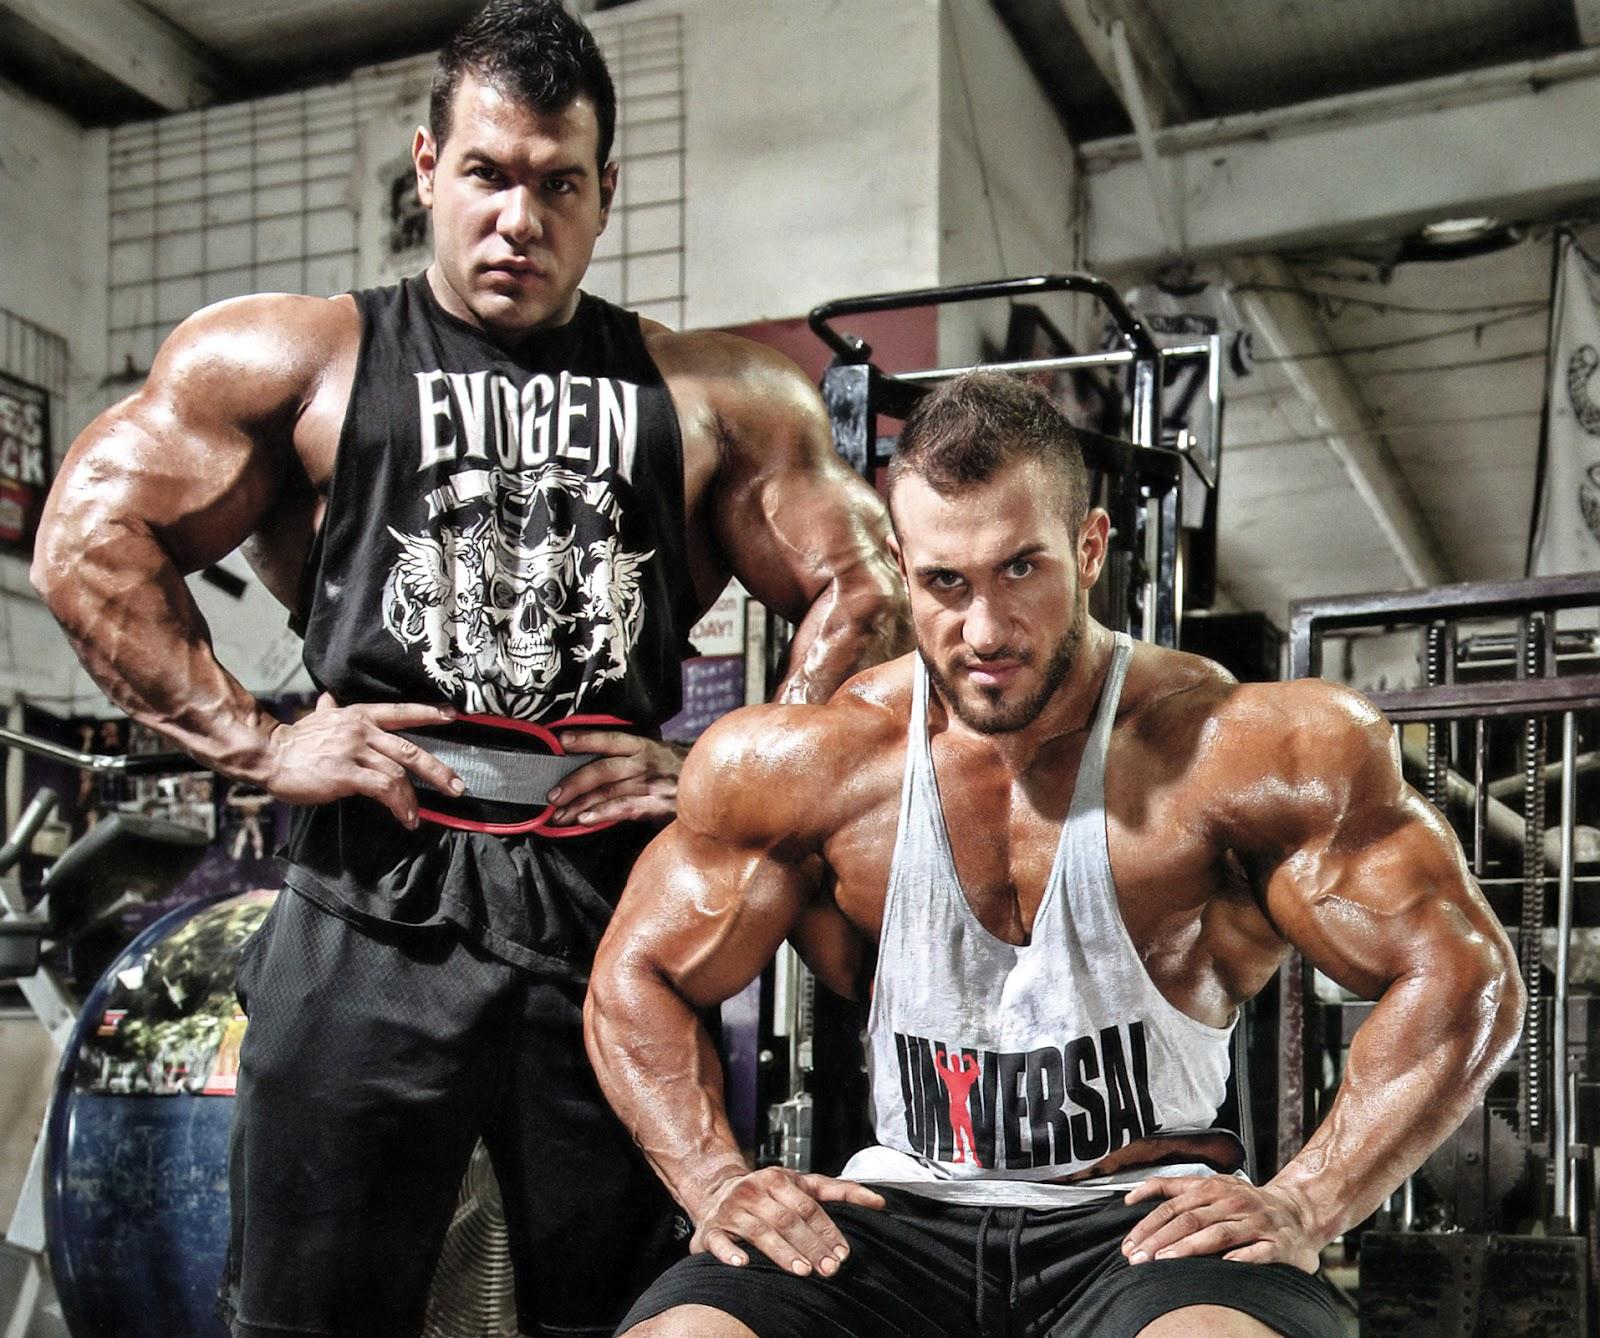 Article: Steve Kuclo & Antoine Vaillant - MD photoshoot!